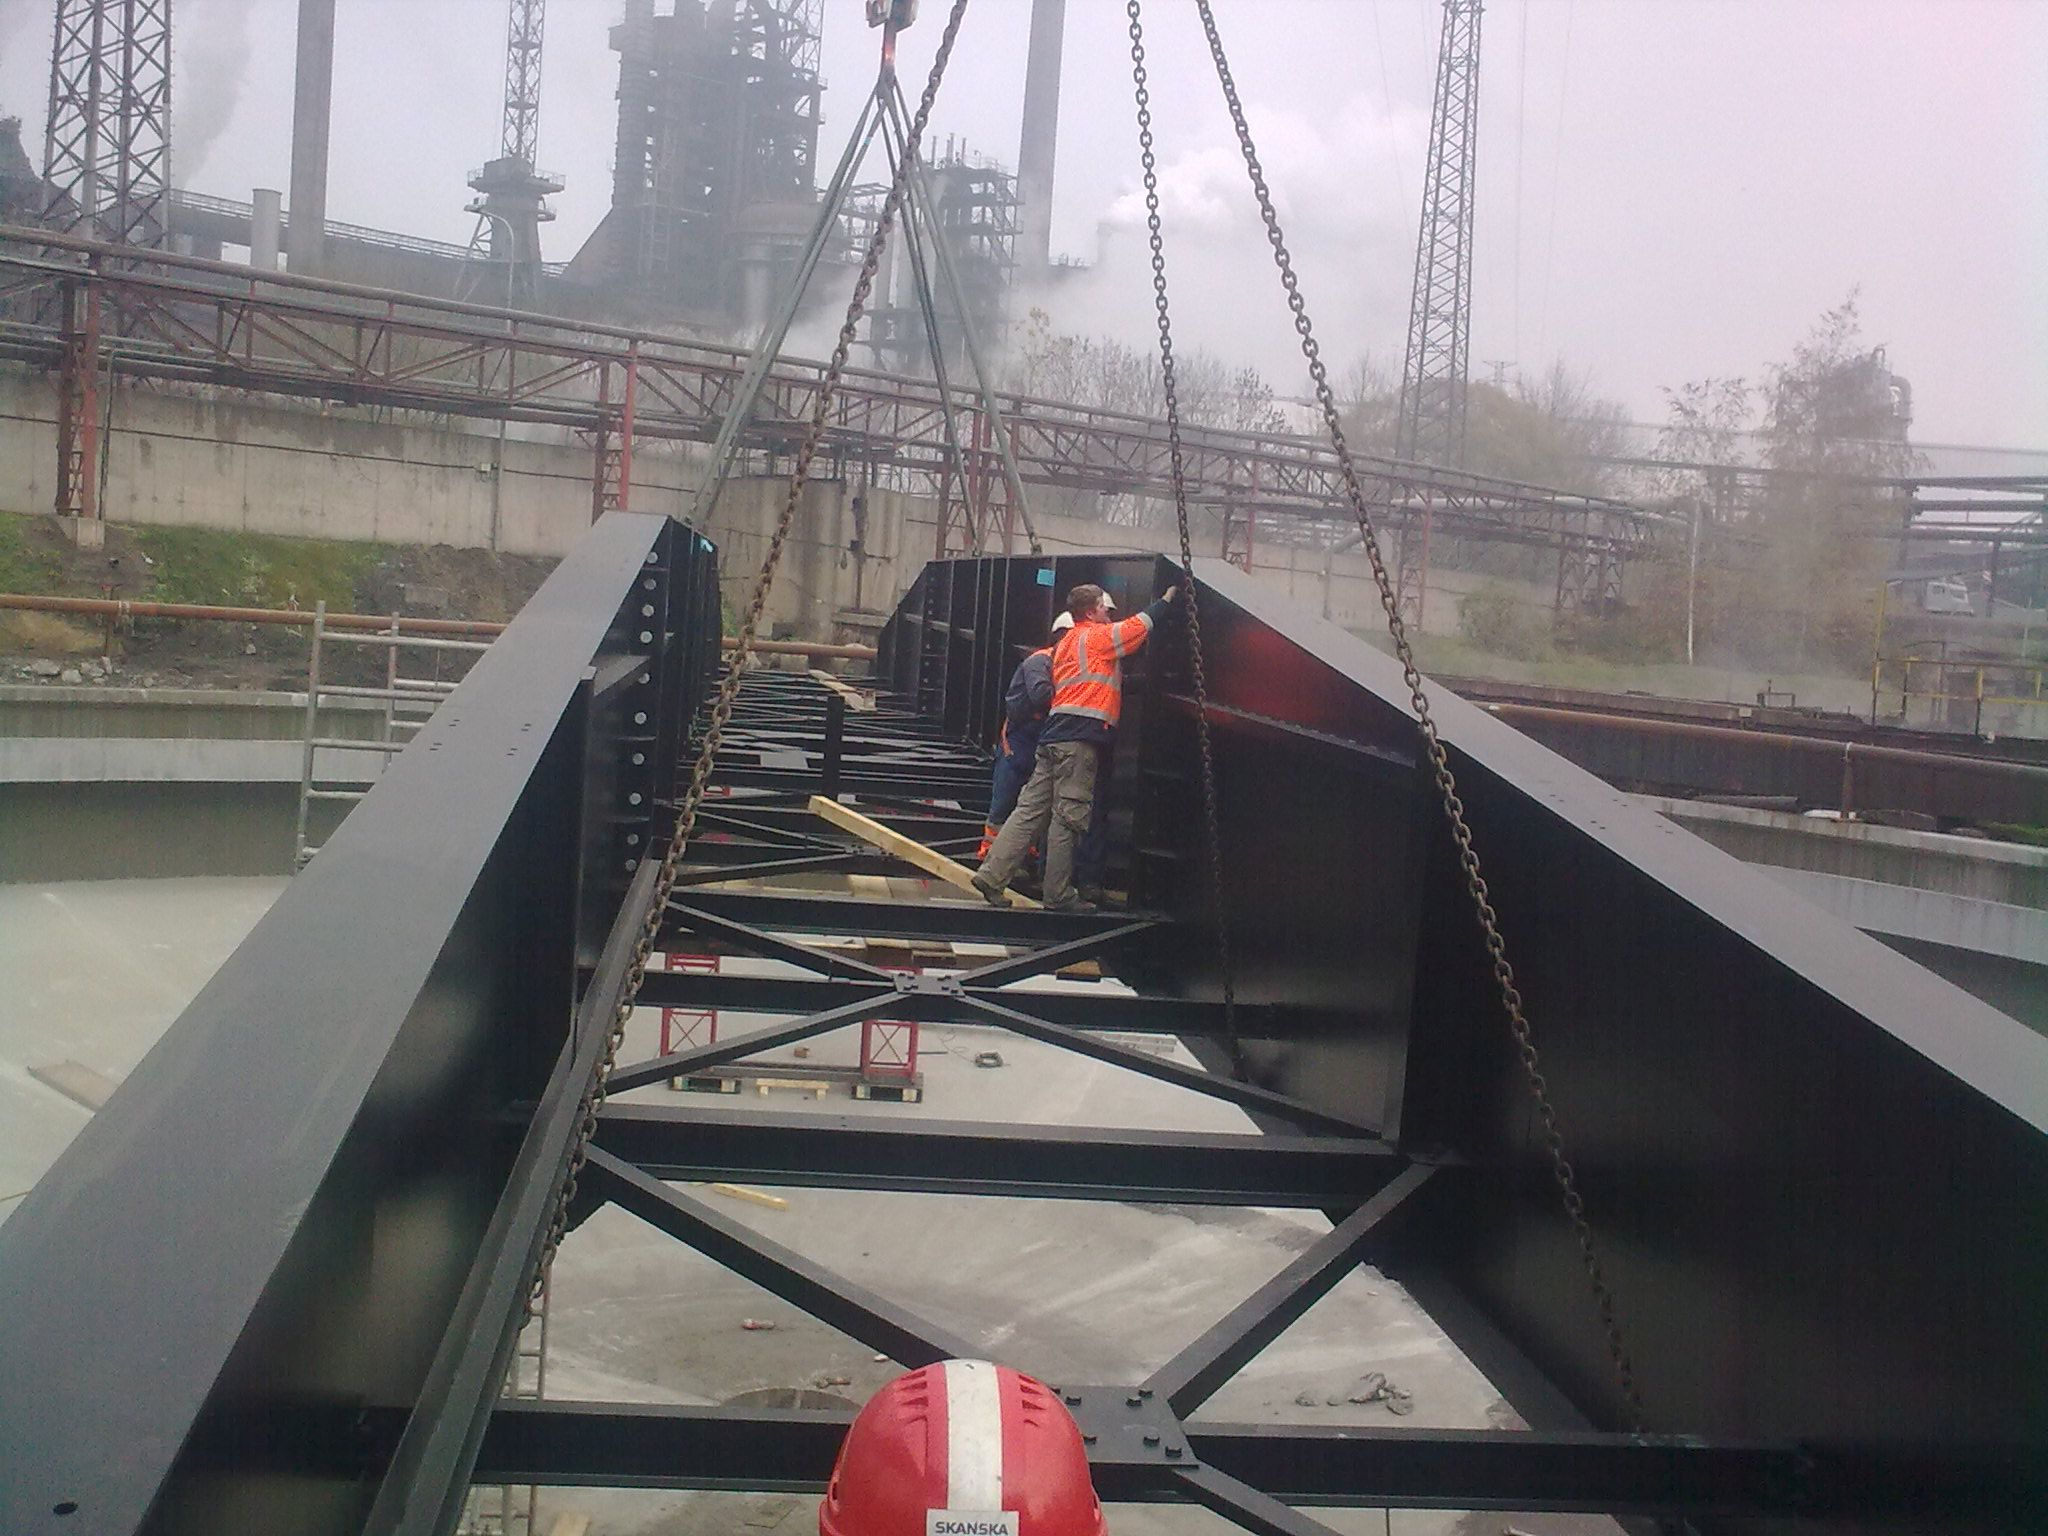 Rekonstrukce chladícího okruhu plynočistírny - Dorr č.1